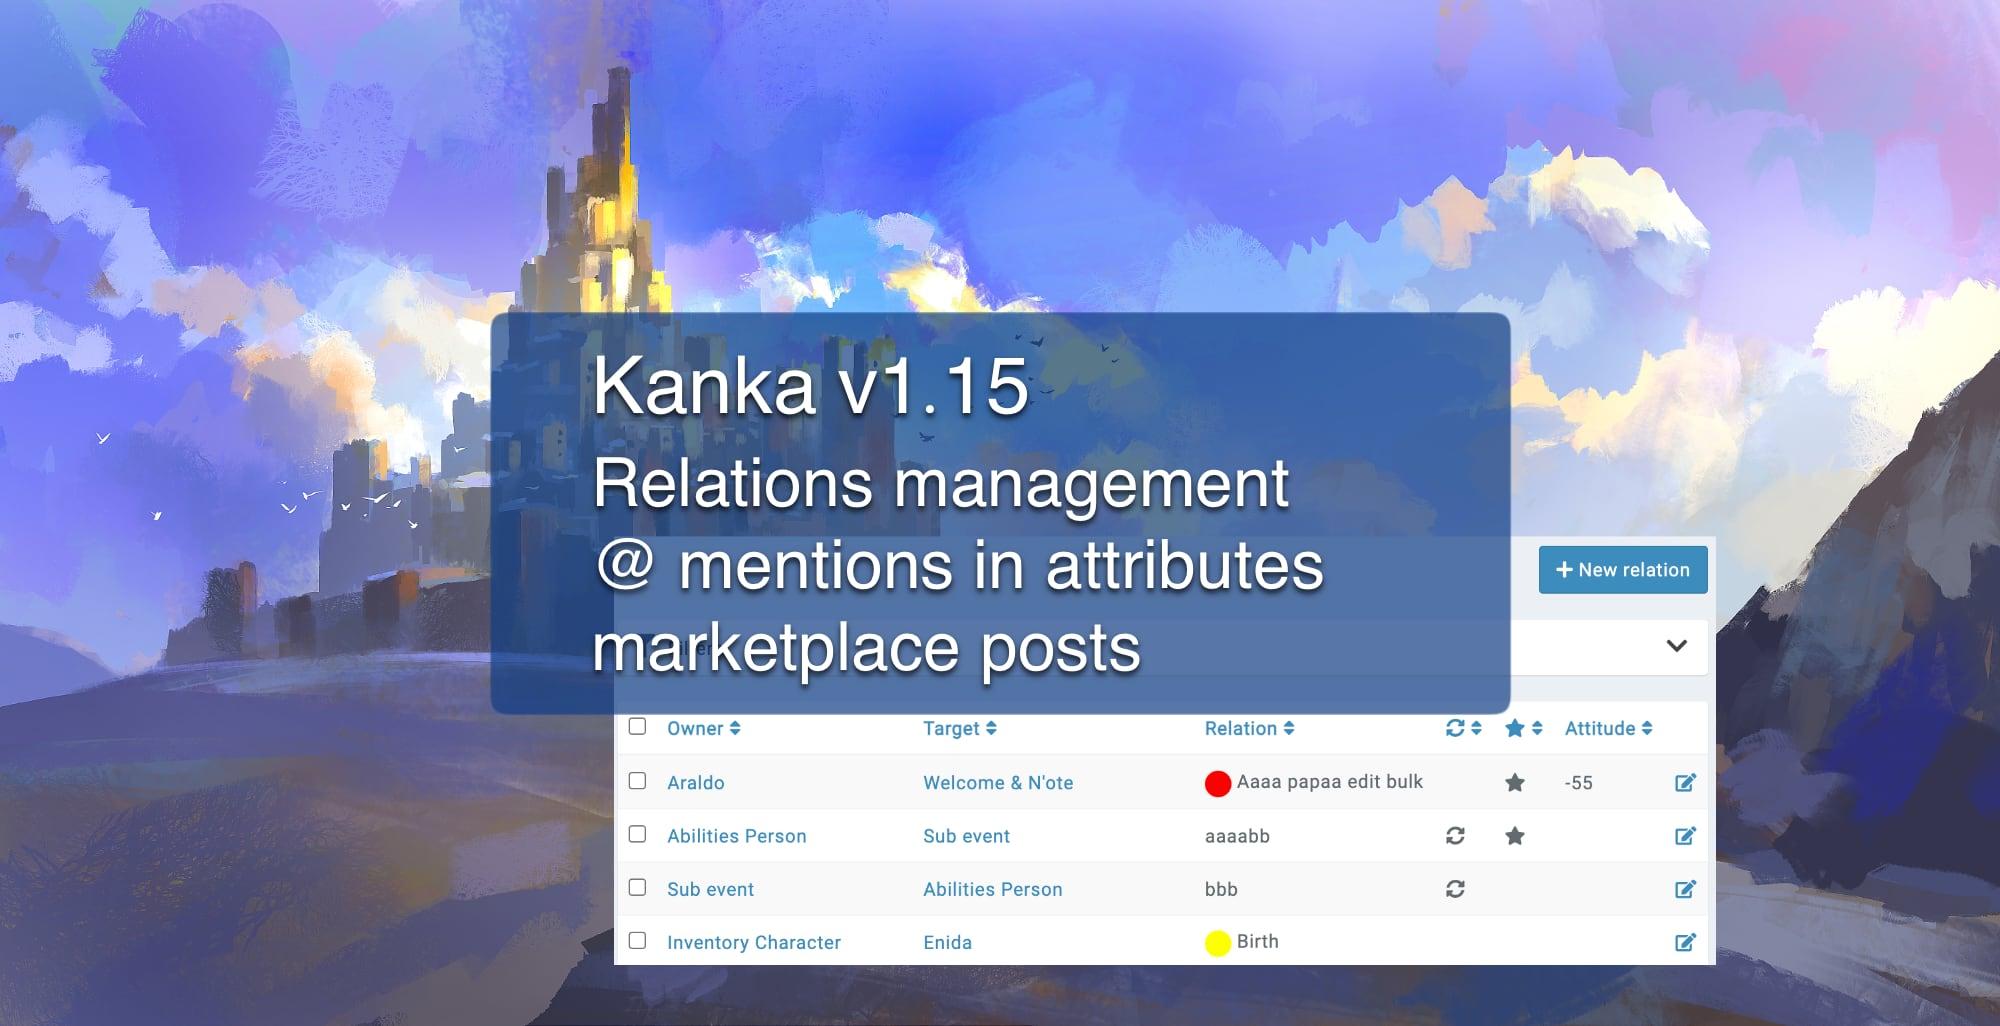 Kanka 1.15 - Relations management